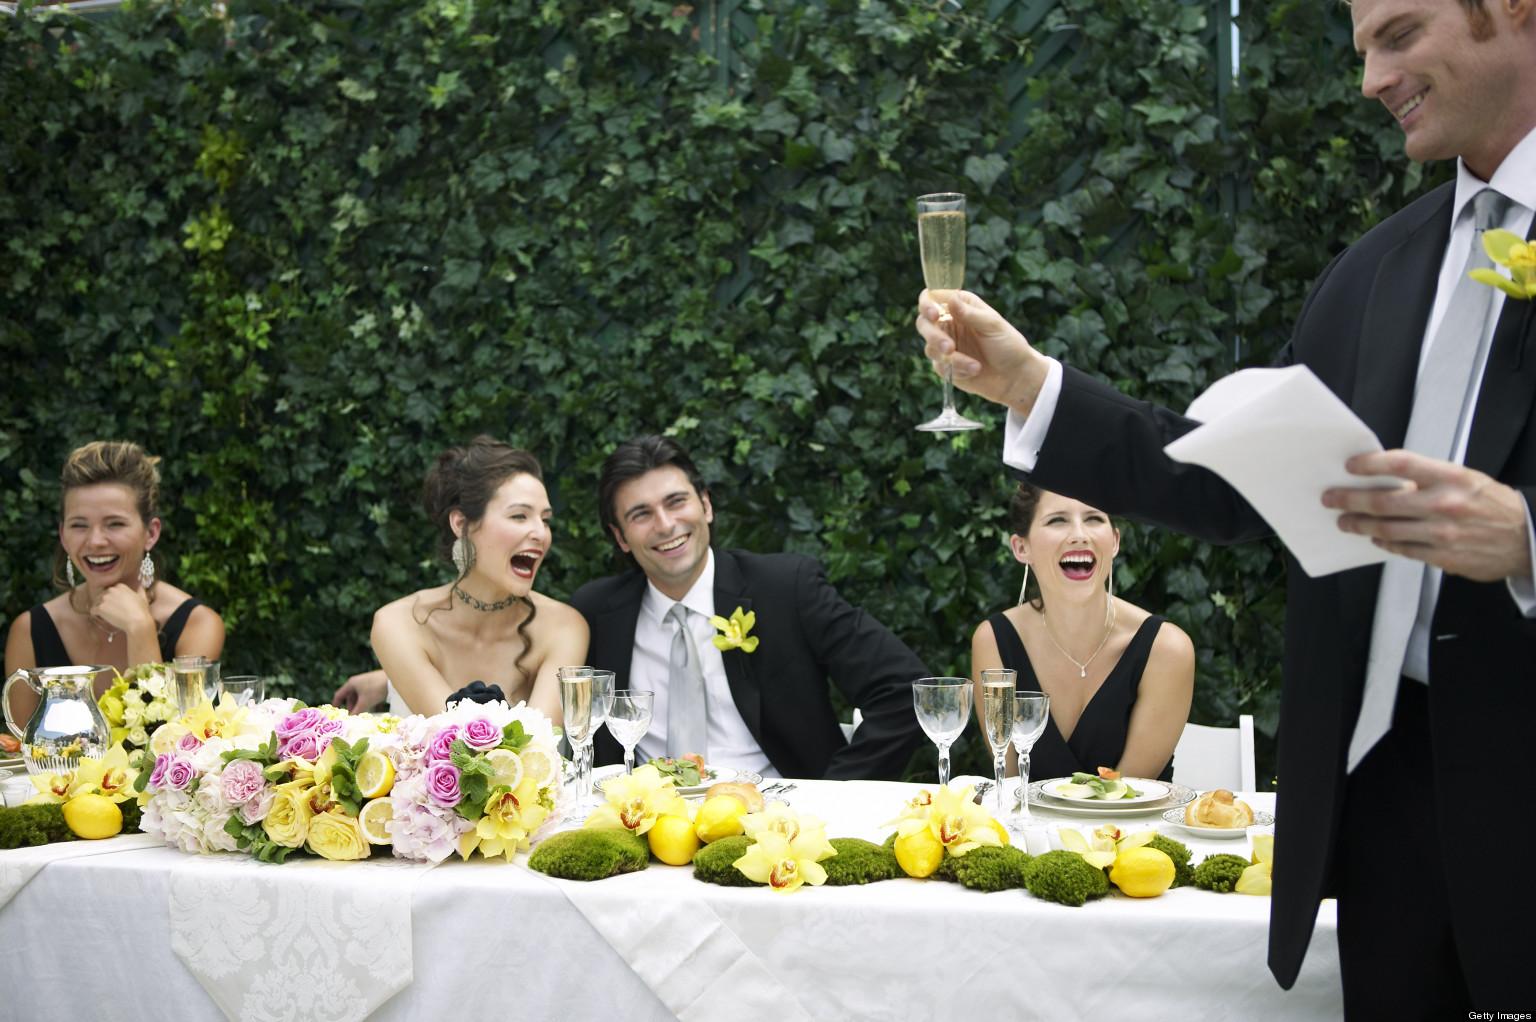 o-EX-WEDDING-TOAST-facebook.jpg